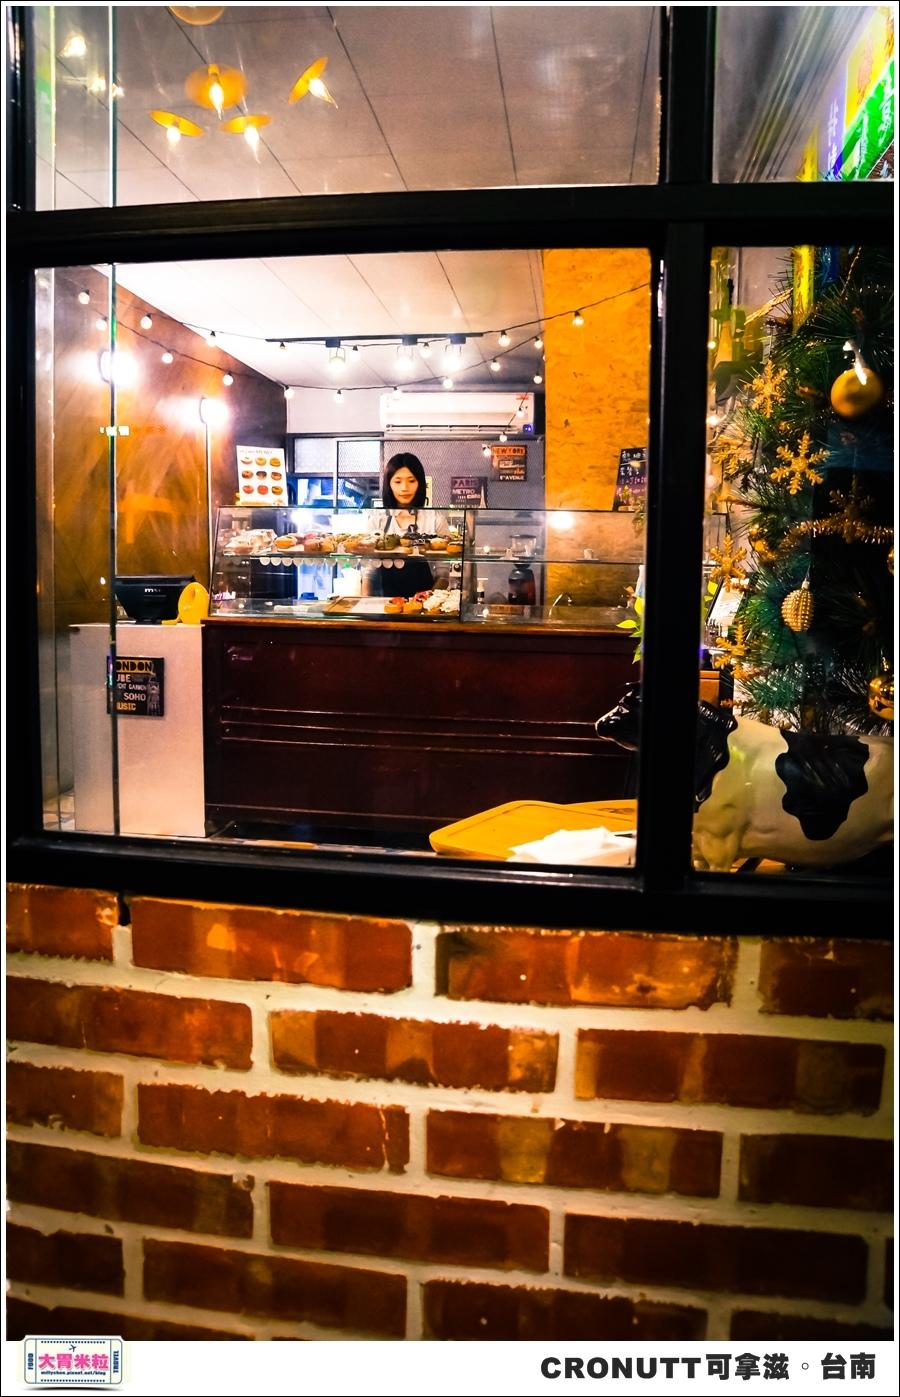 CRONUTT可拿滋台南店@紐約可頌甜甜圈@大胃米粒0005.jpg